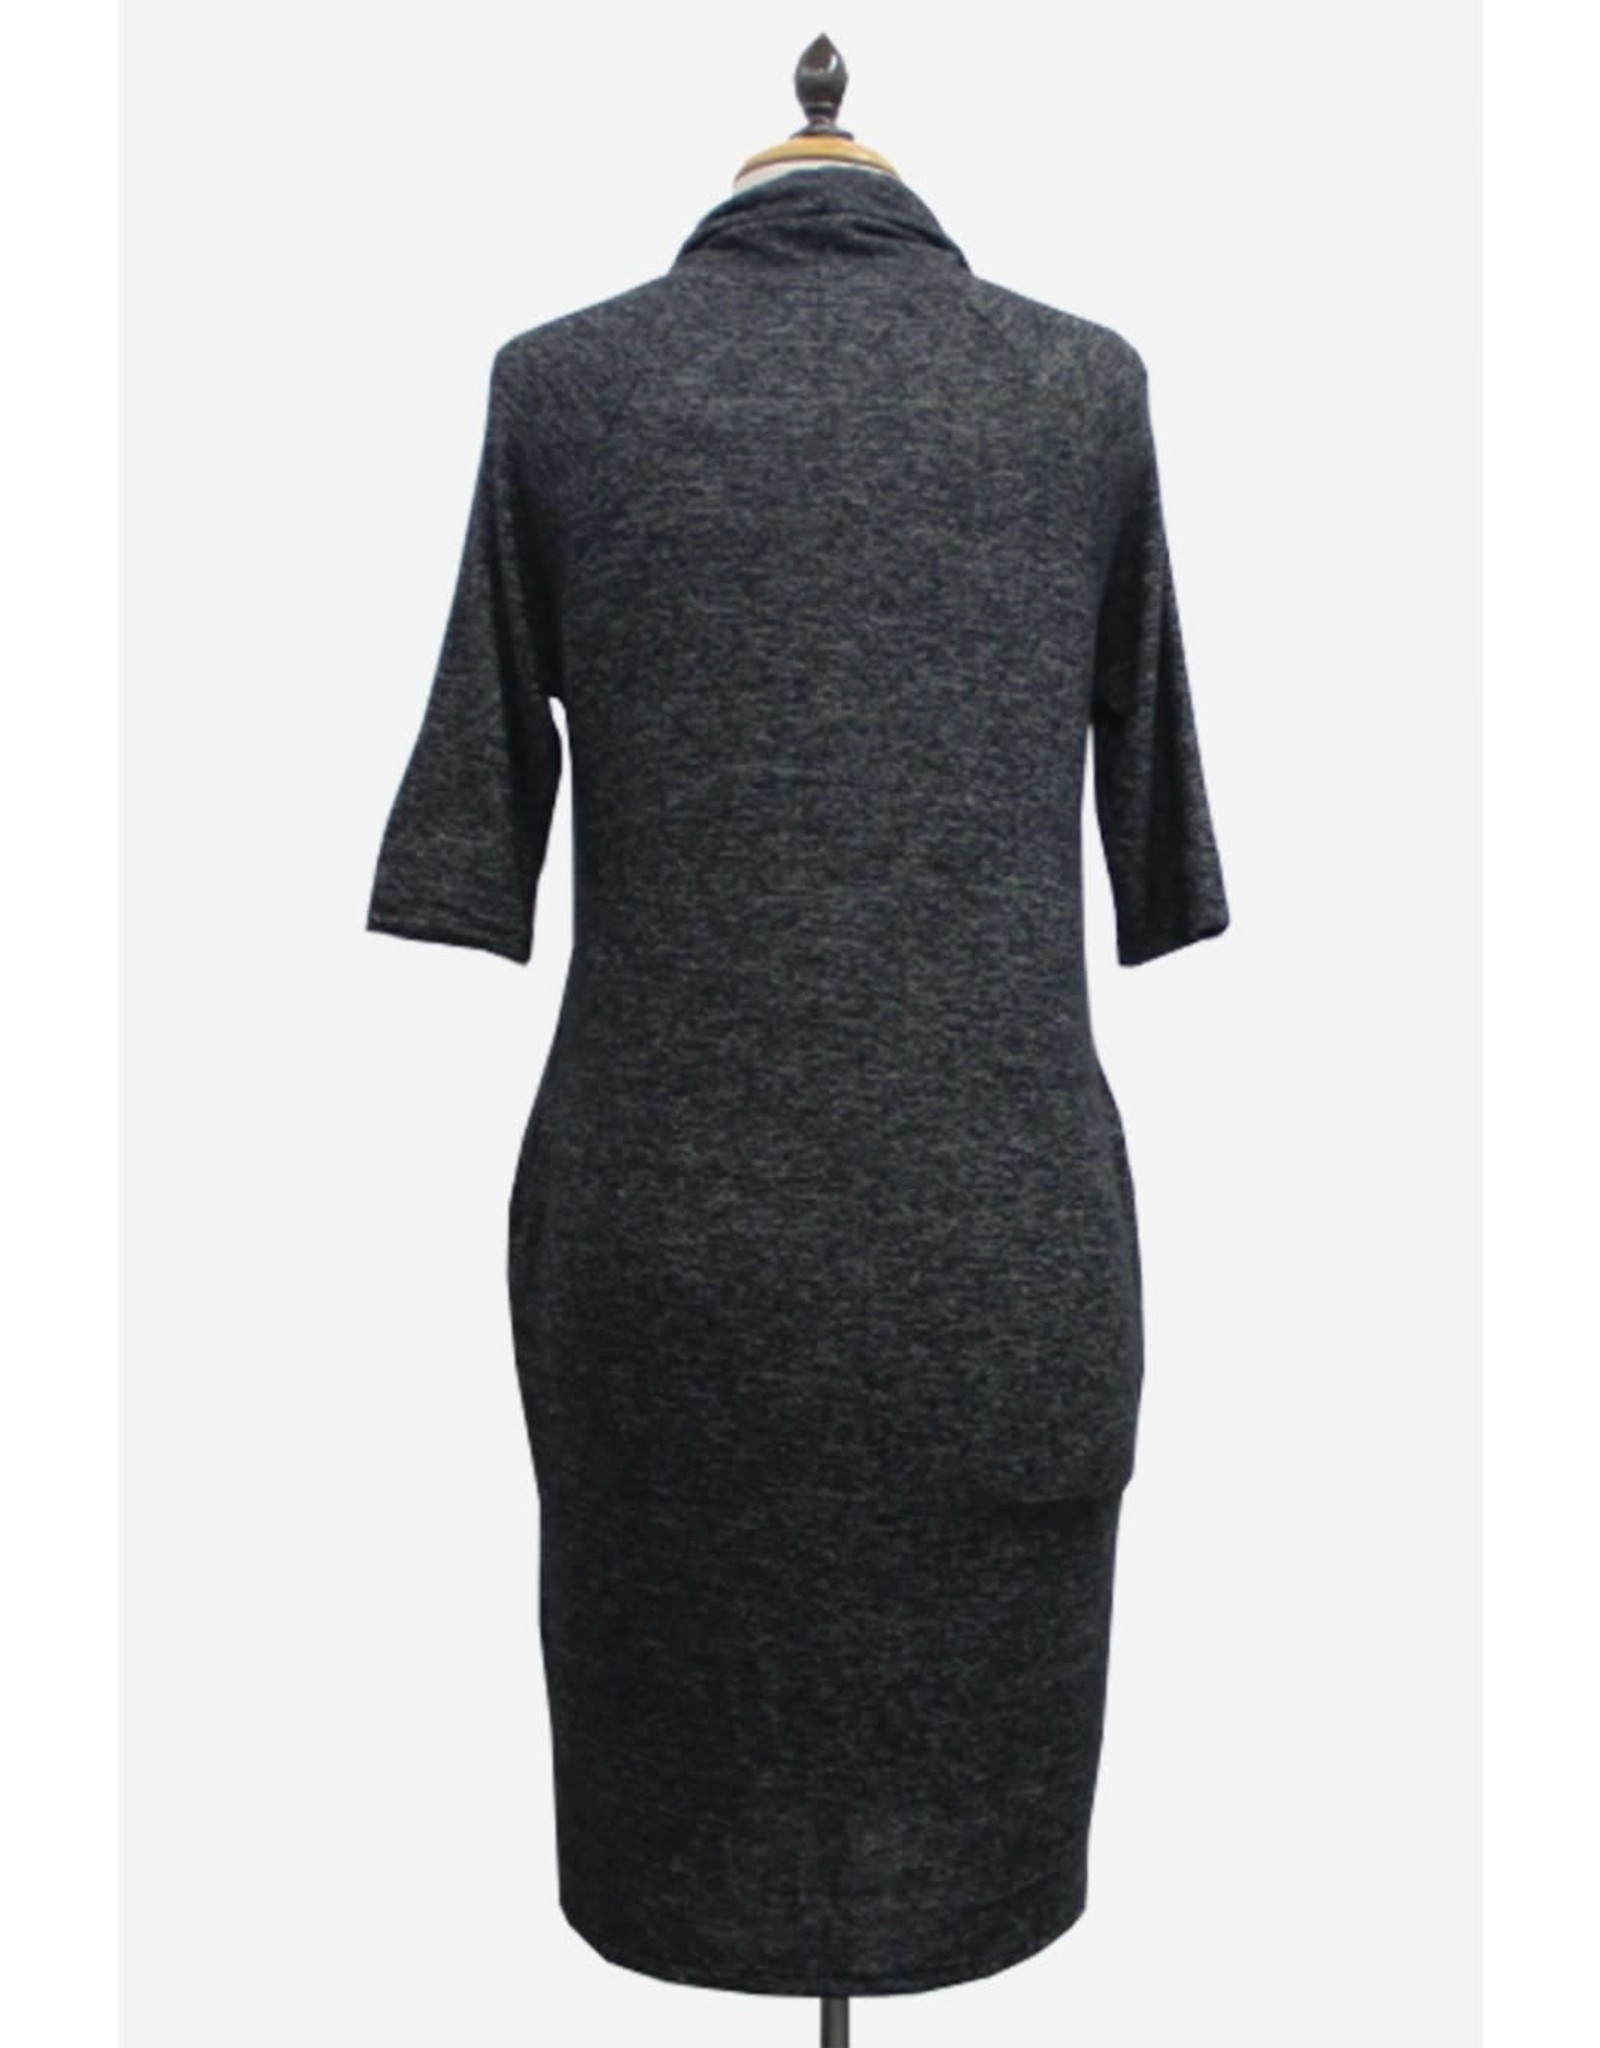 Coin1804 Cozy Cowl Neck Dress w Pkts